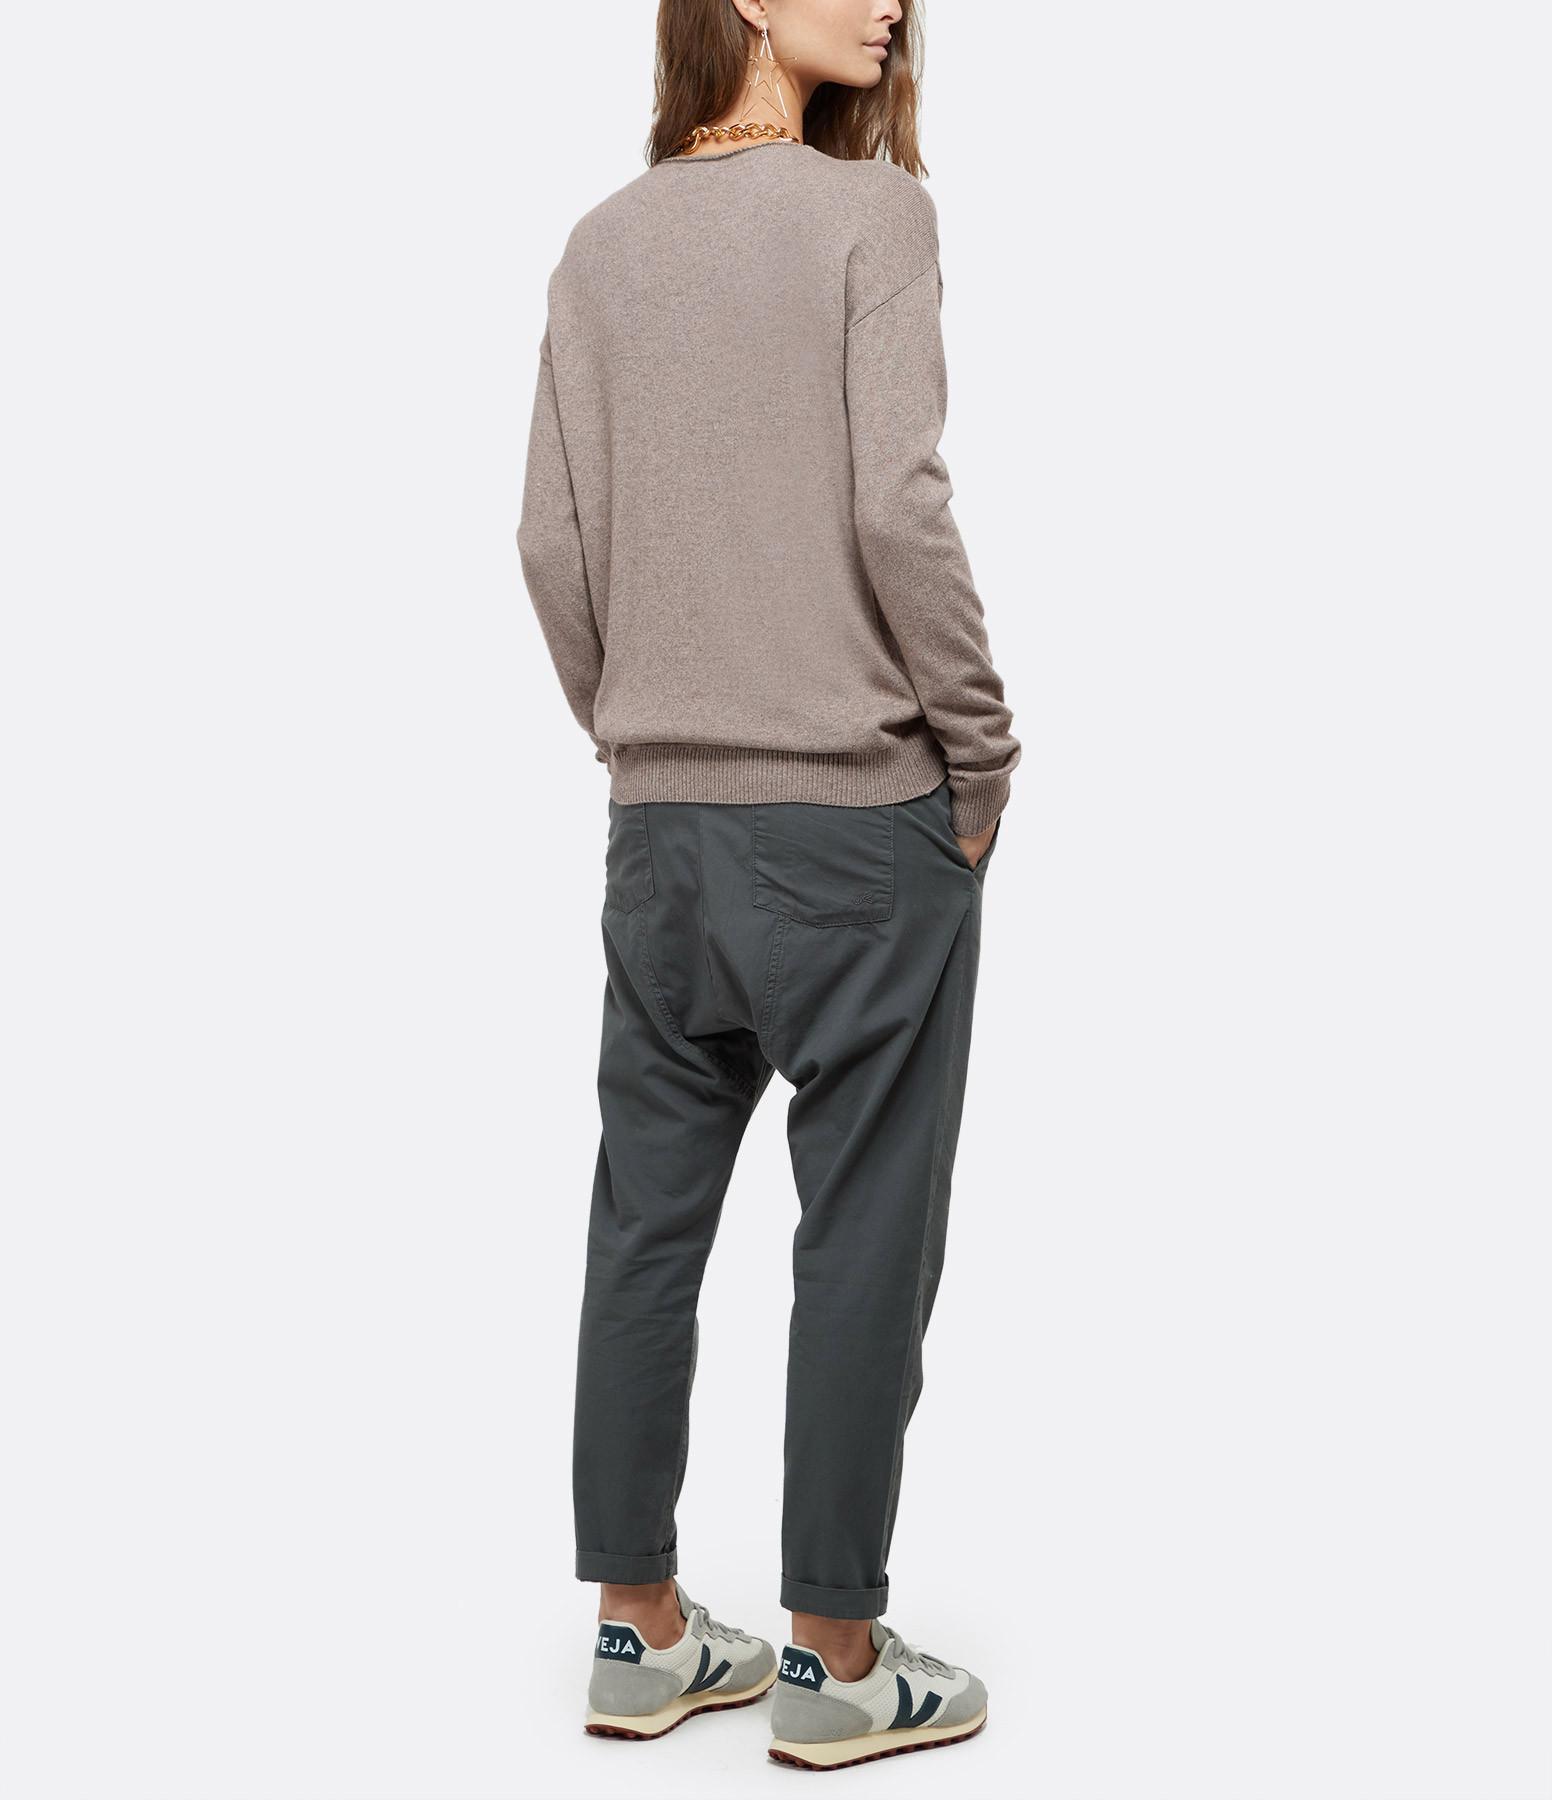 JEANNE VOULAND - Pantalon Darel Cargo Asphalt